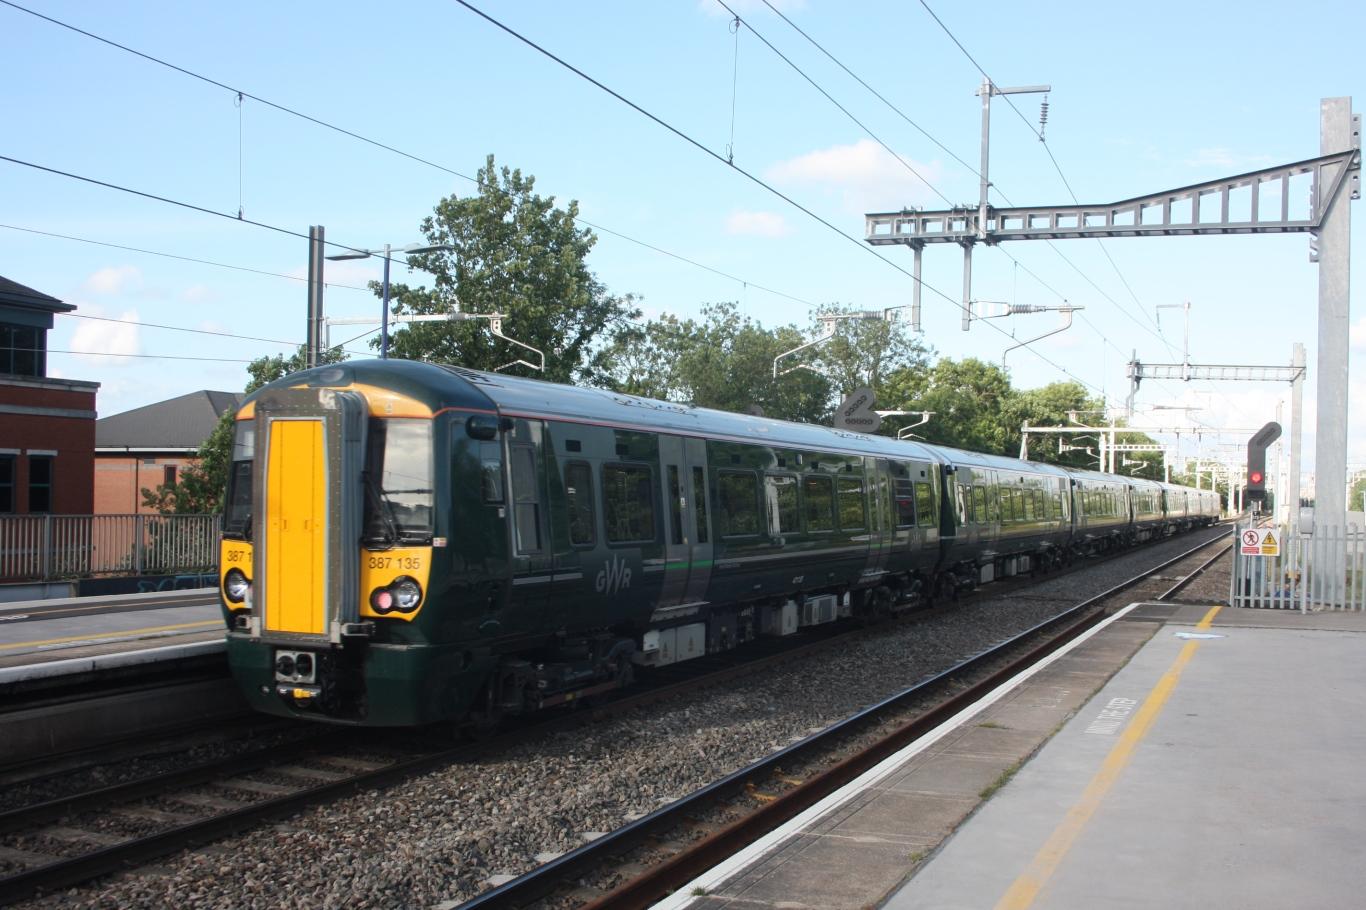 GWR Class 387